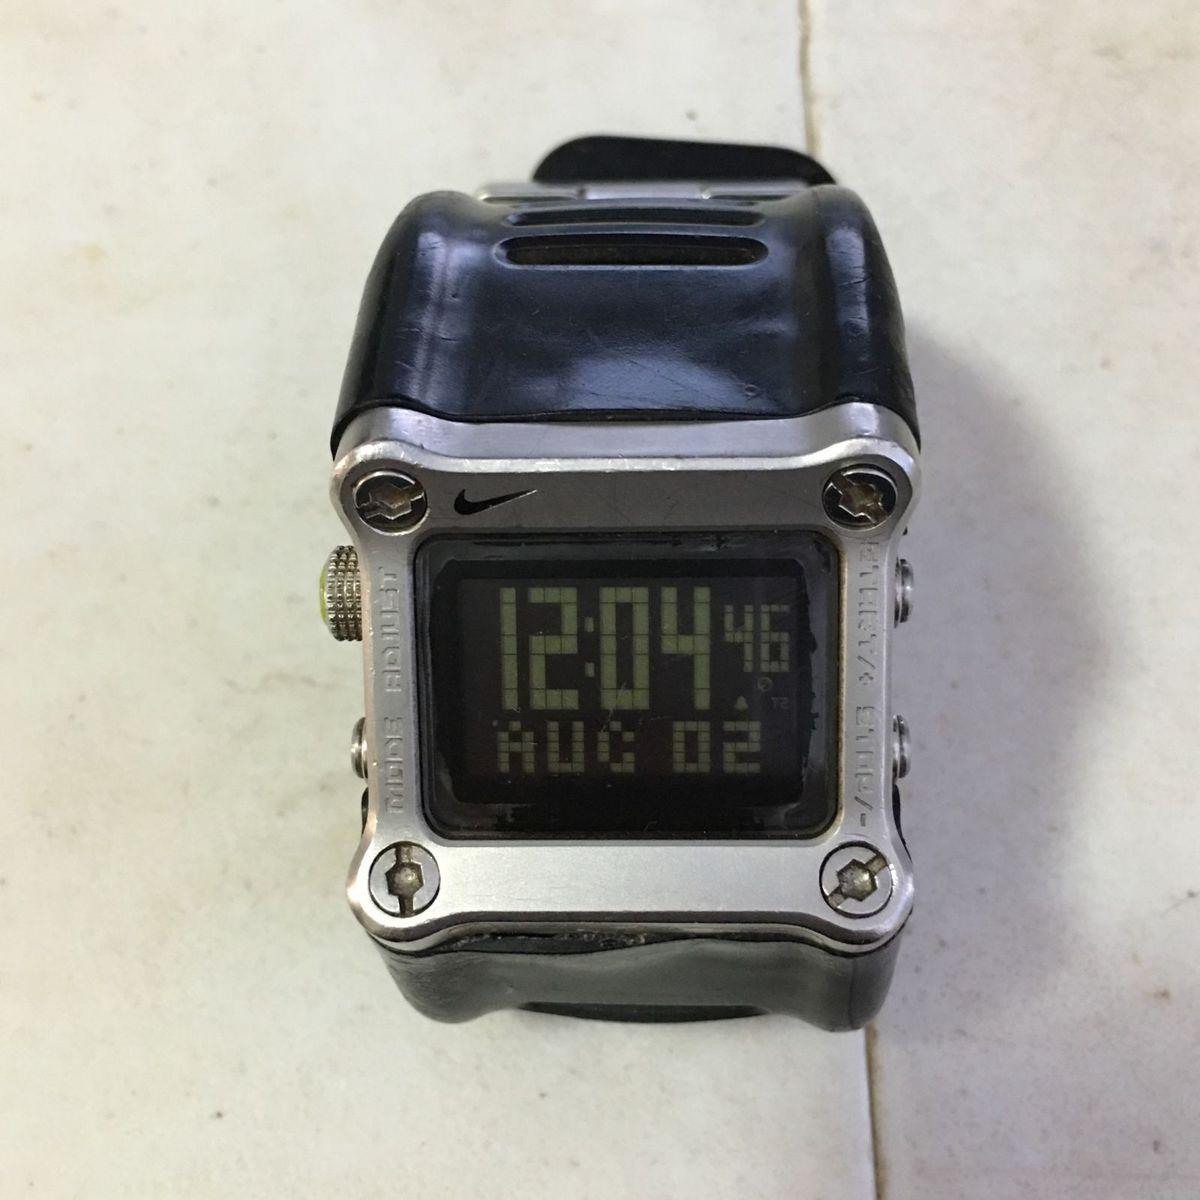 06f41caac7a Relógio Nike Raridade